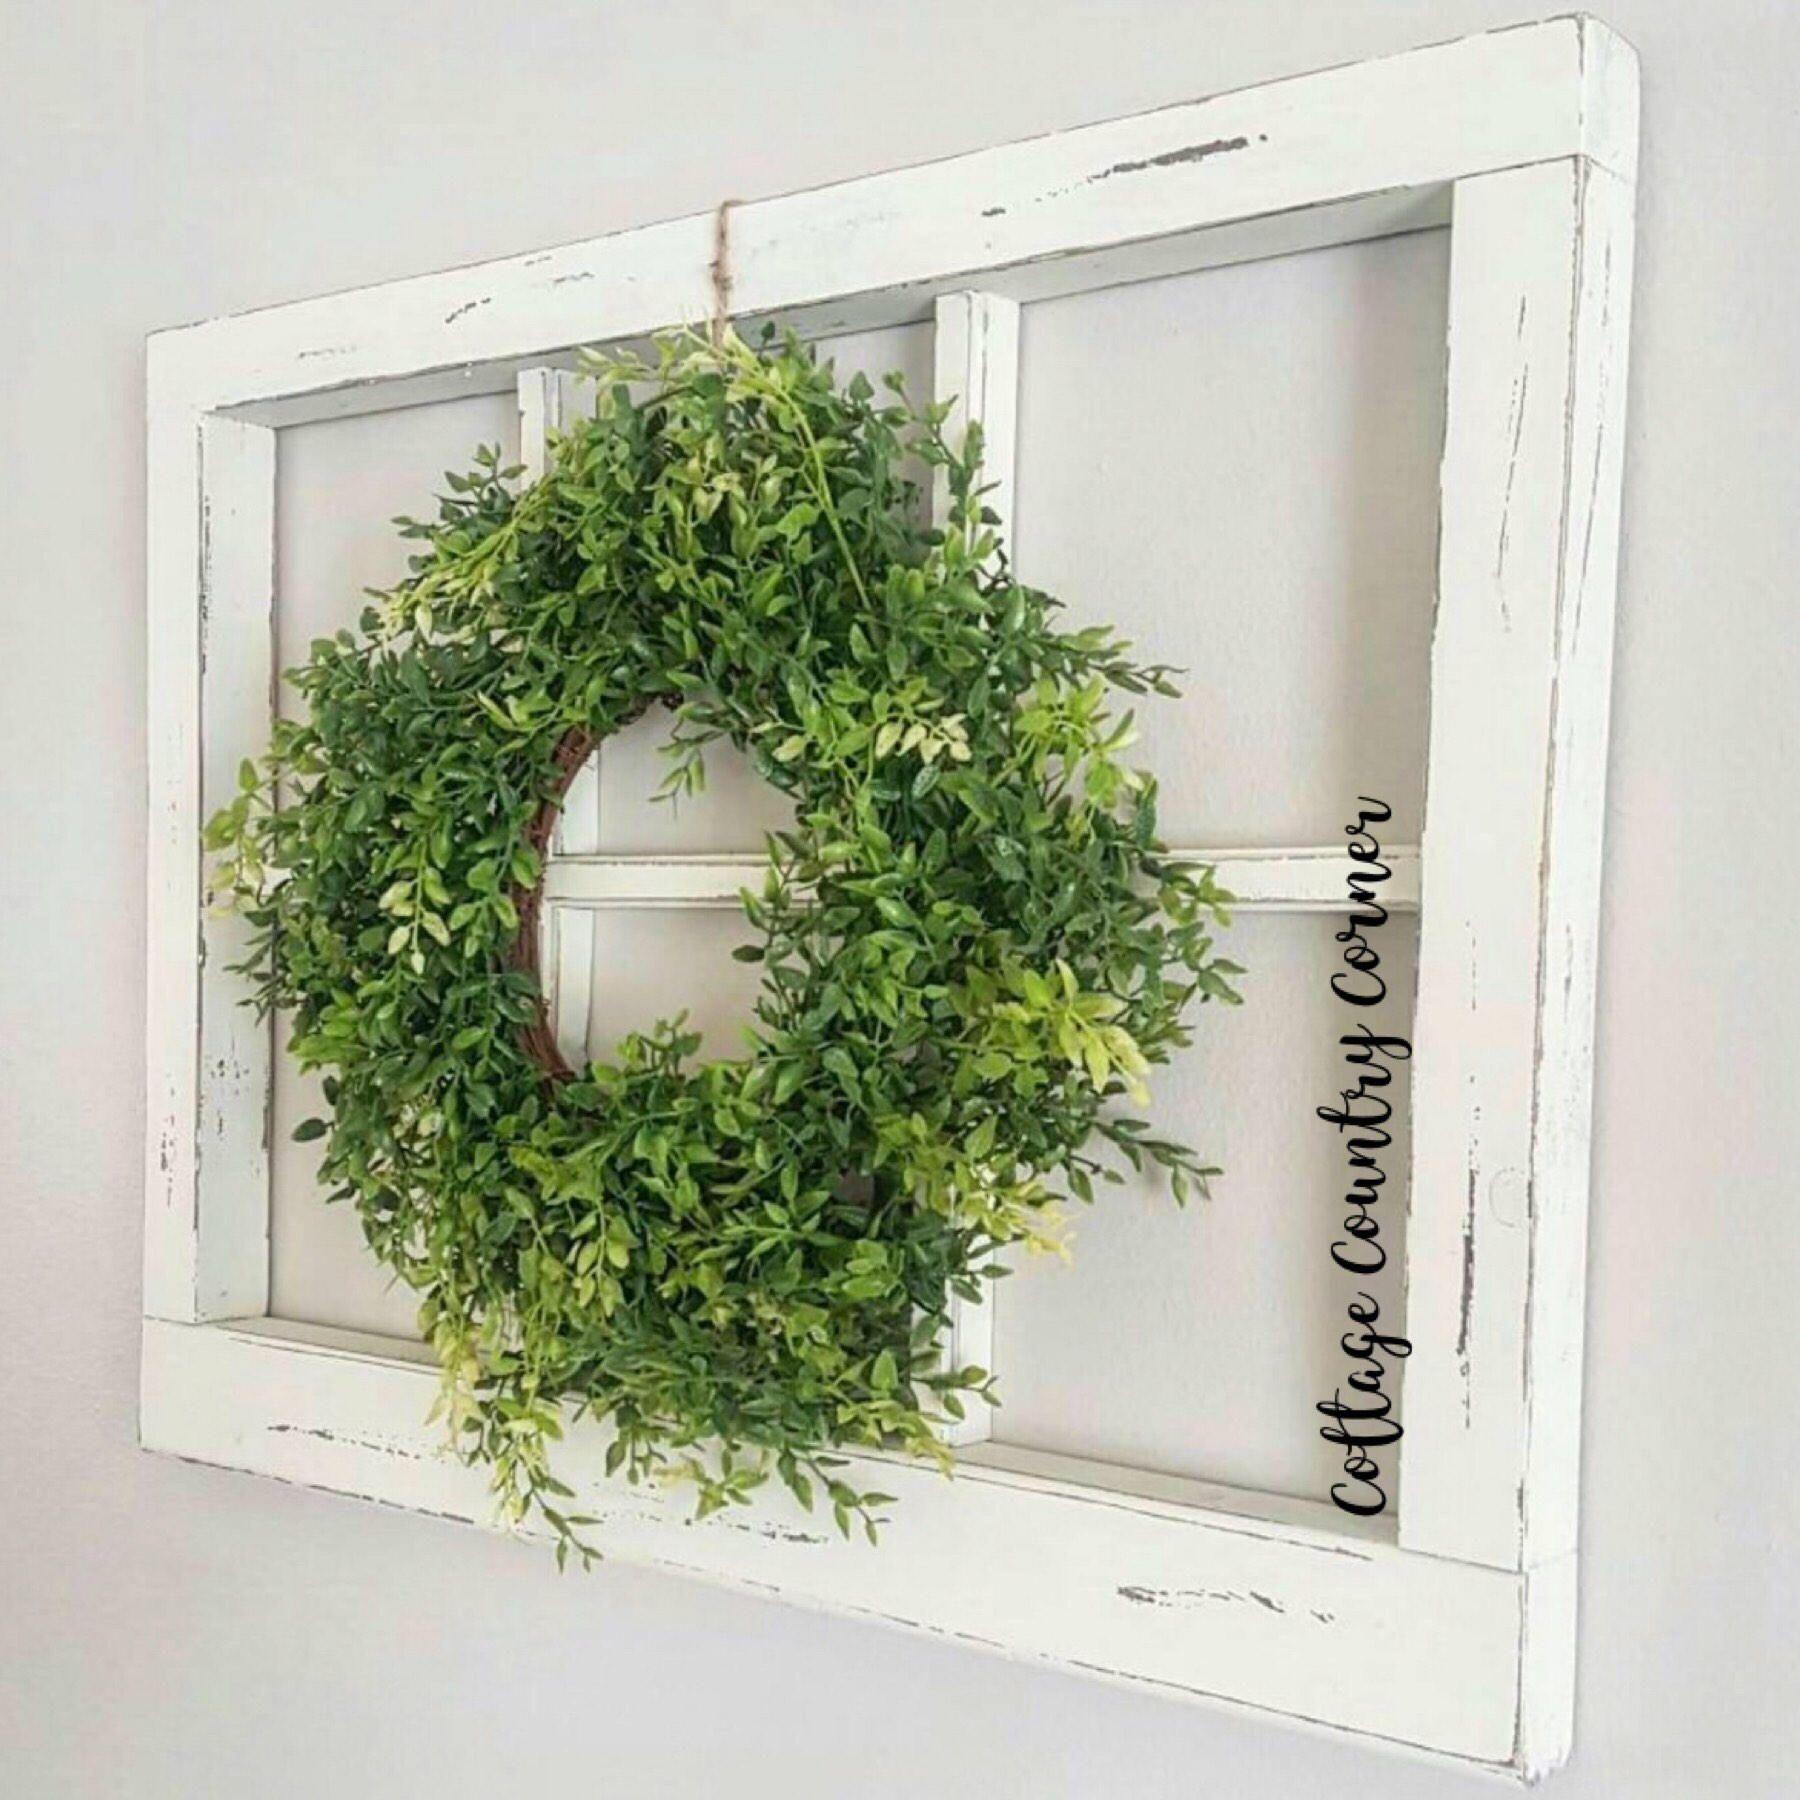 6 Pane Window Frame Wreath Google Search Rustic Window Frame Frame Wall Decor Window Frame Decor